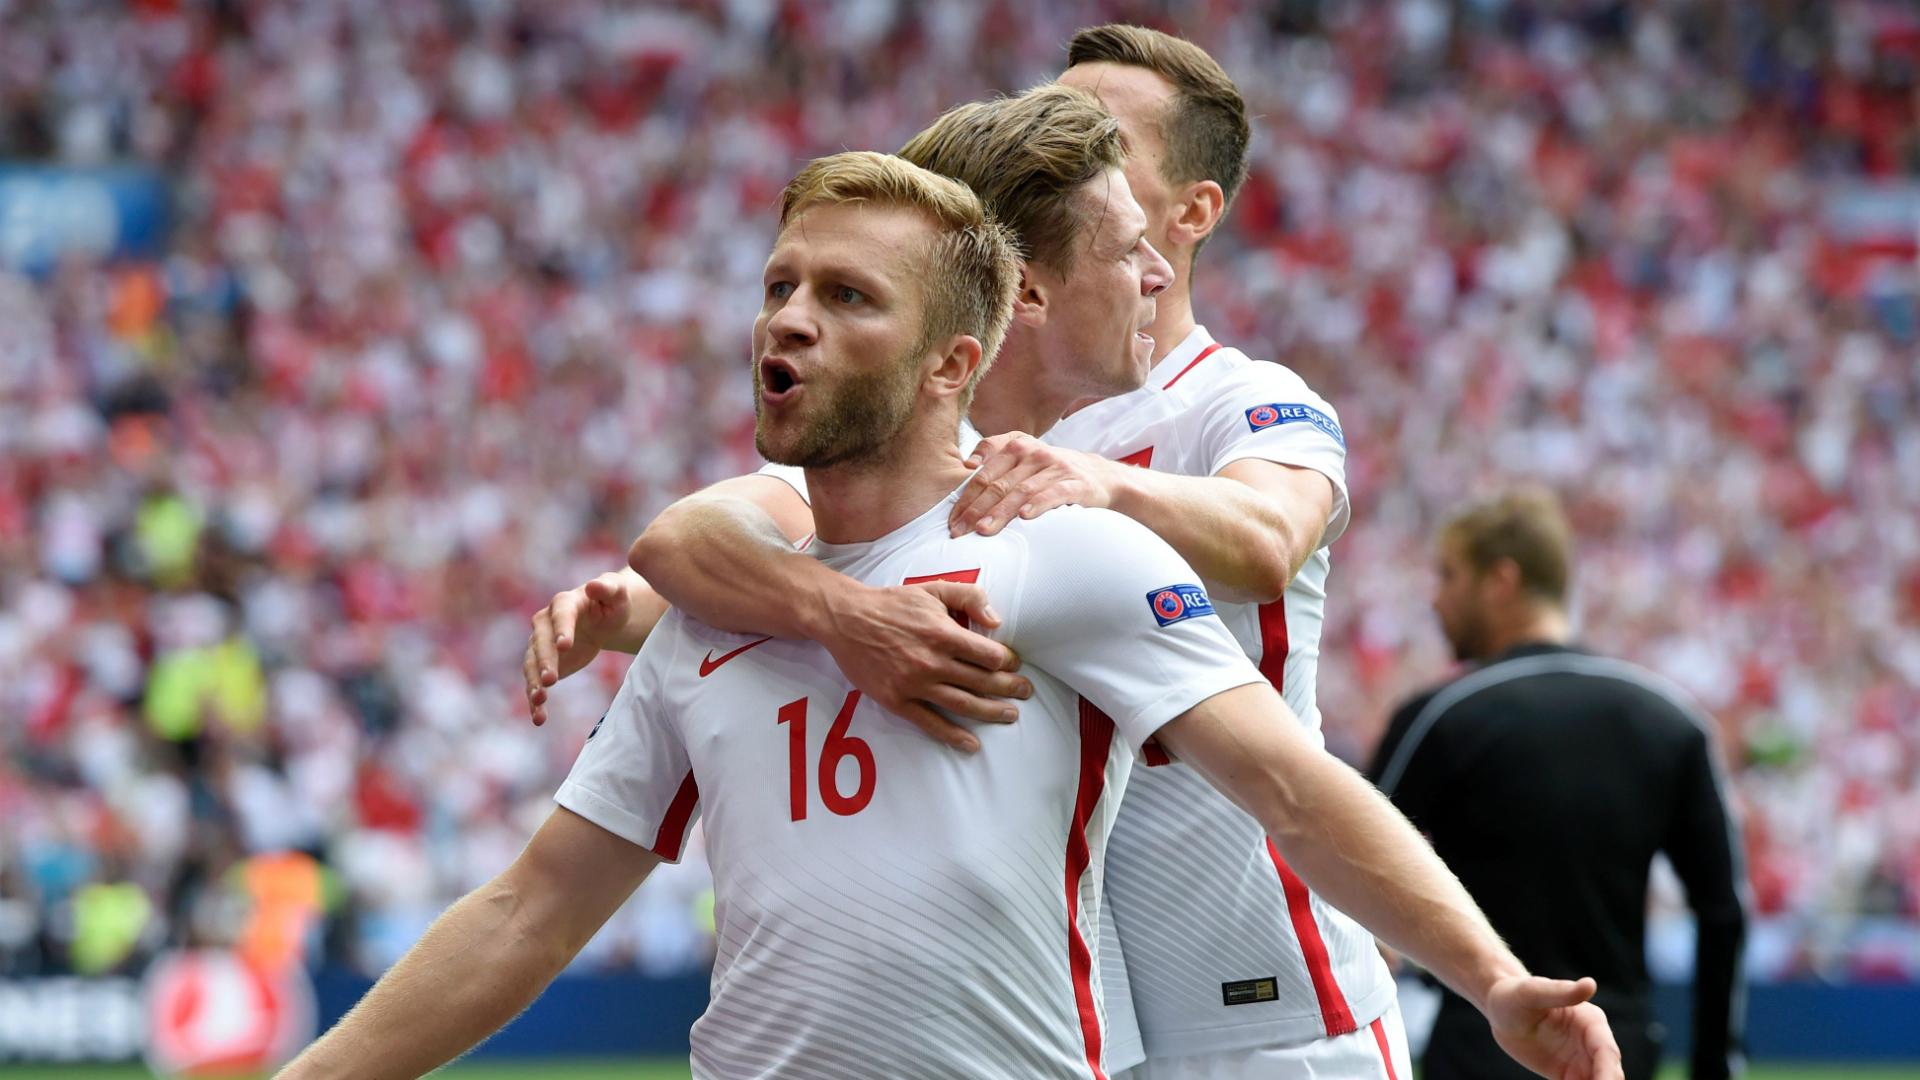 Euro 2016: Shaqiri unhappy with Poland celebrations